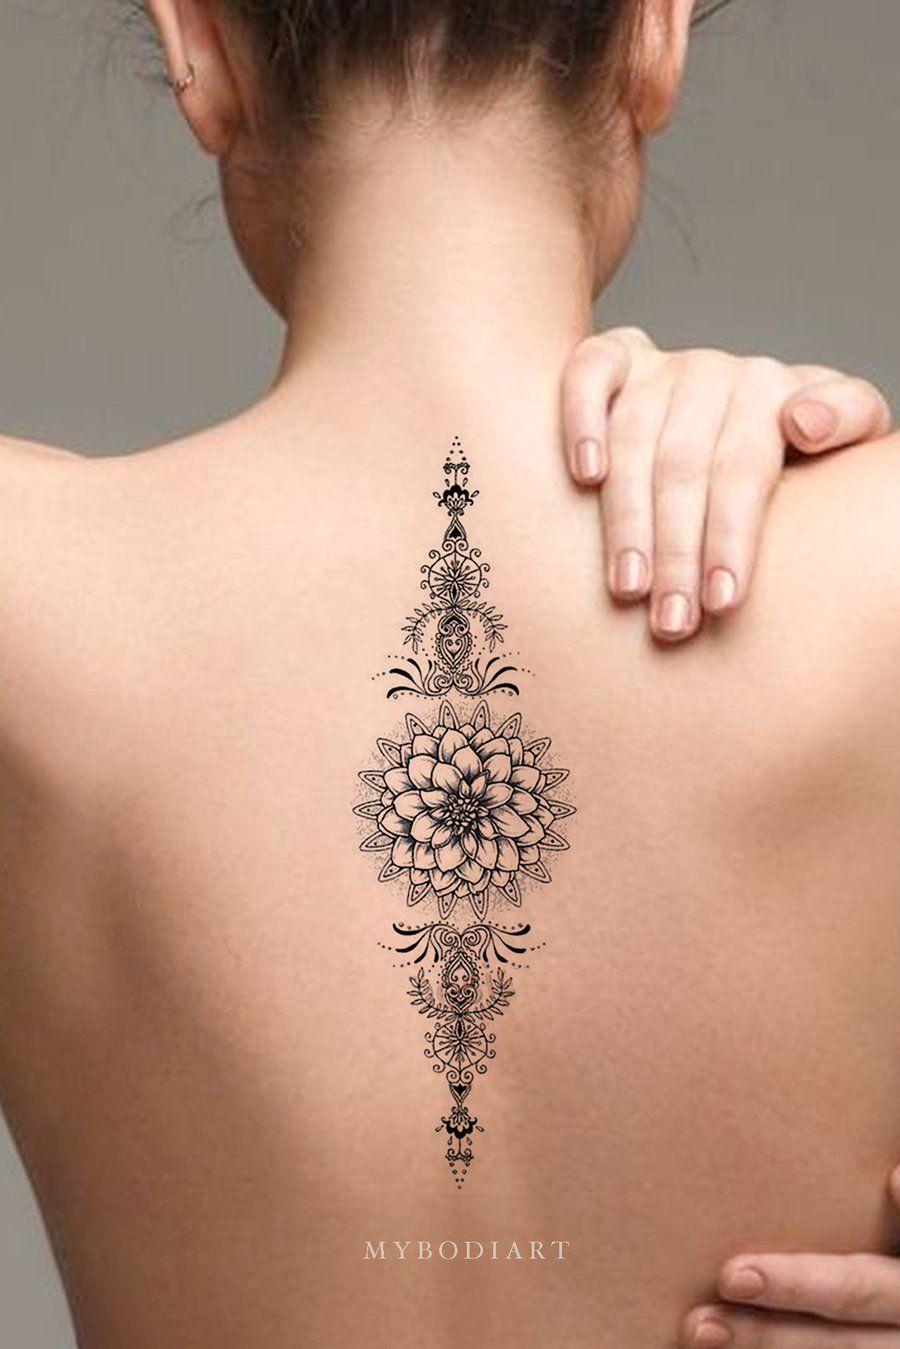 Tribal Boho Black Lotus Mandala Back Temporary Tattoo Ideas For Women Www Mybo Tribal Boho Black Lo With Images Boho Tattoos Delicate Tattoos For Women Temp Tattoo